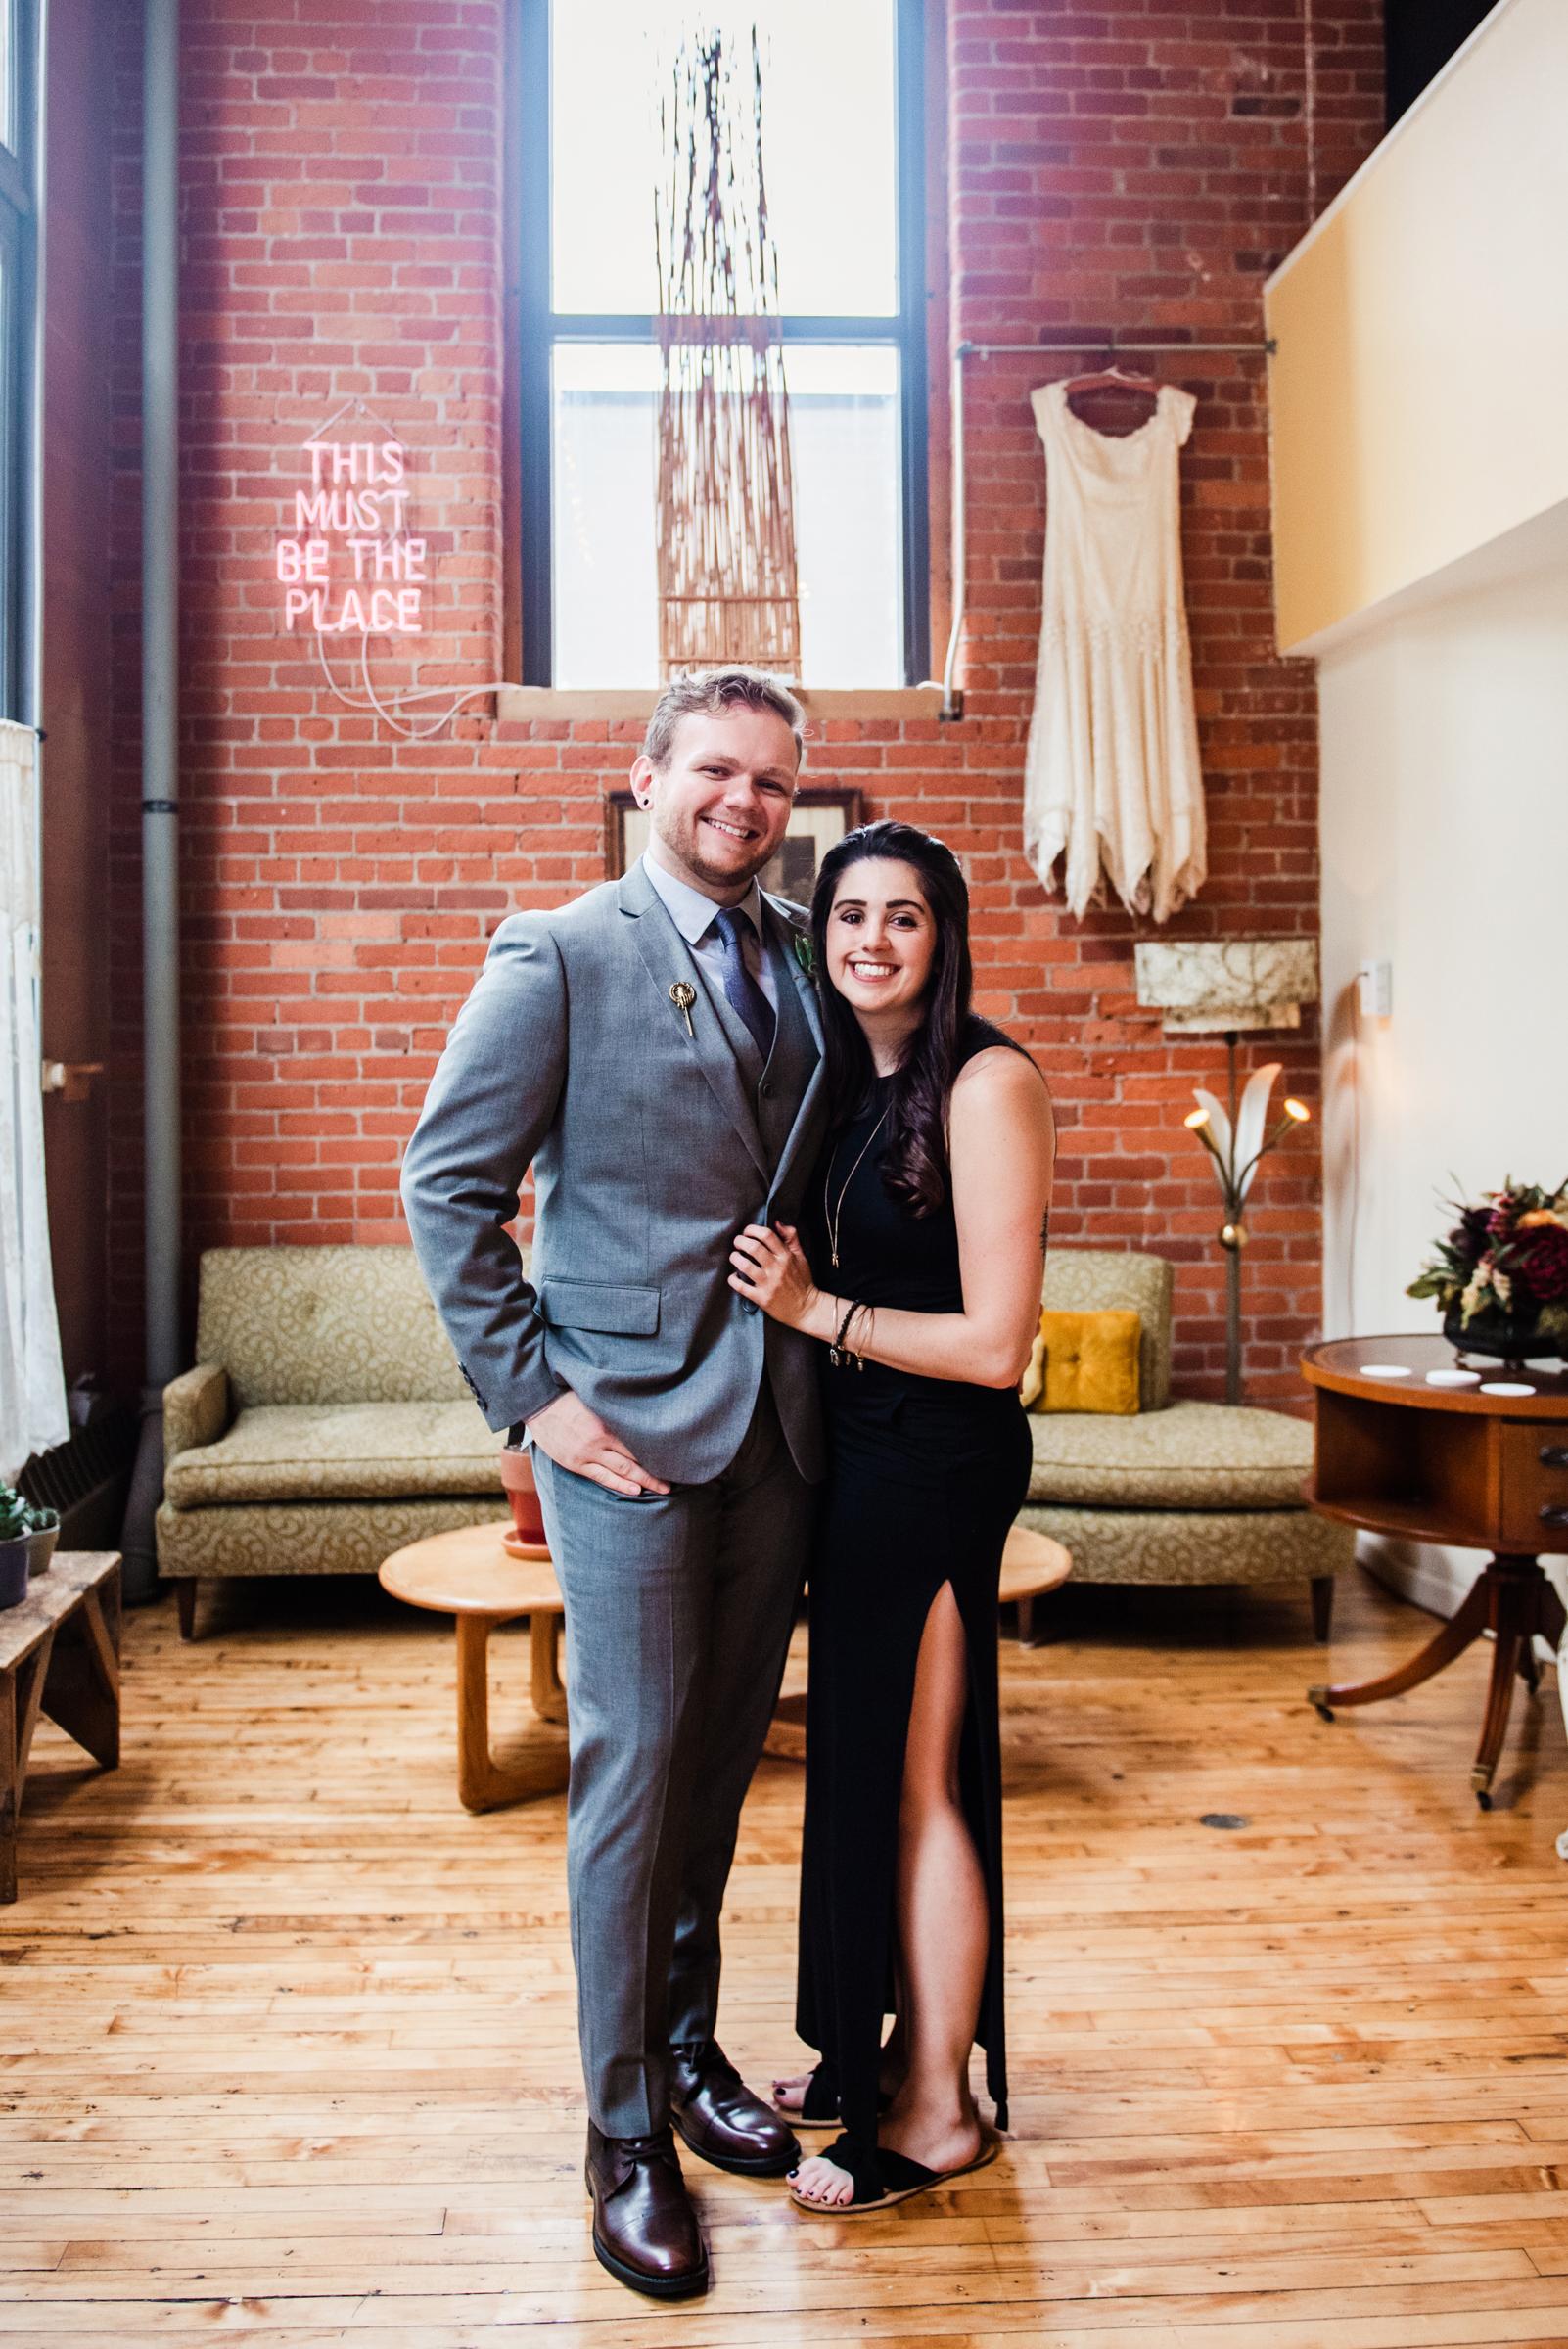 Studio_180_Lamberton_Conservatory_Rochester_Wedding_JILL_STUDIO_Rochester_NY_Photographer_DSC_8873.jpg